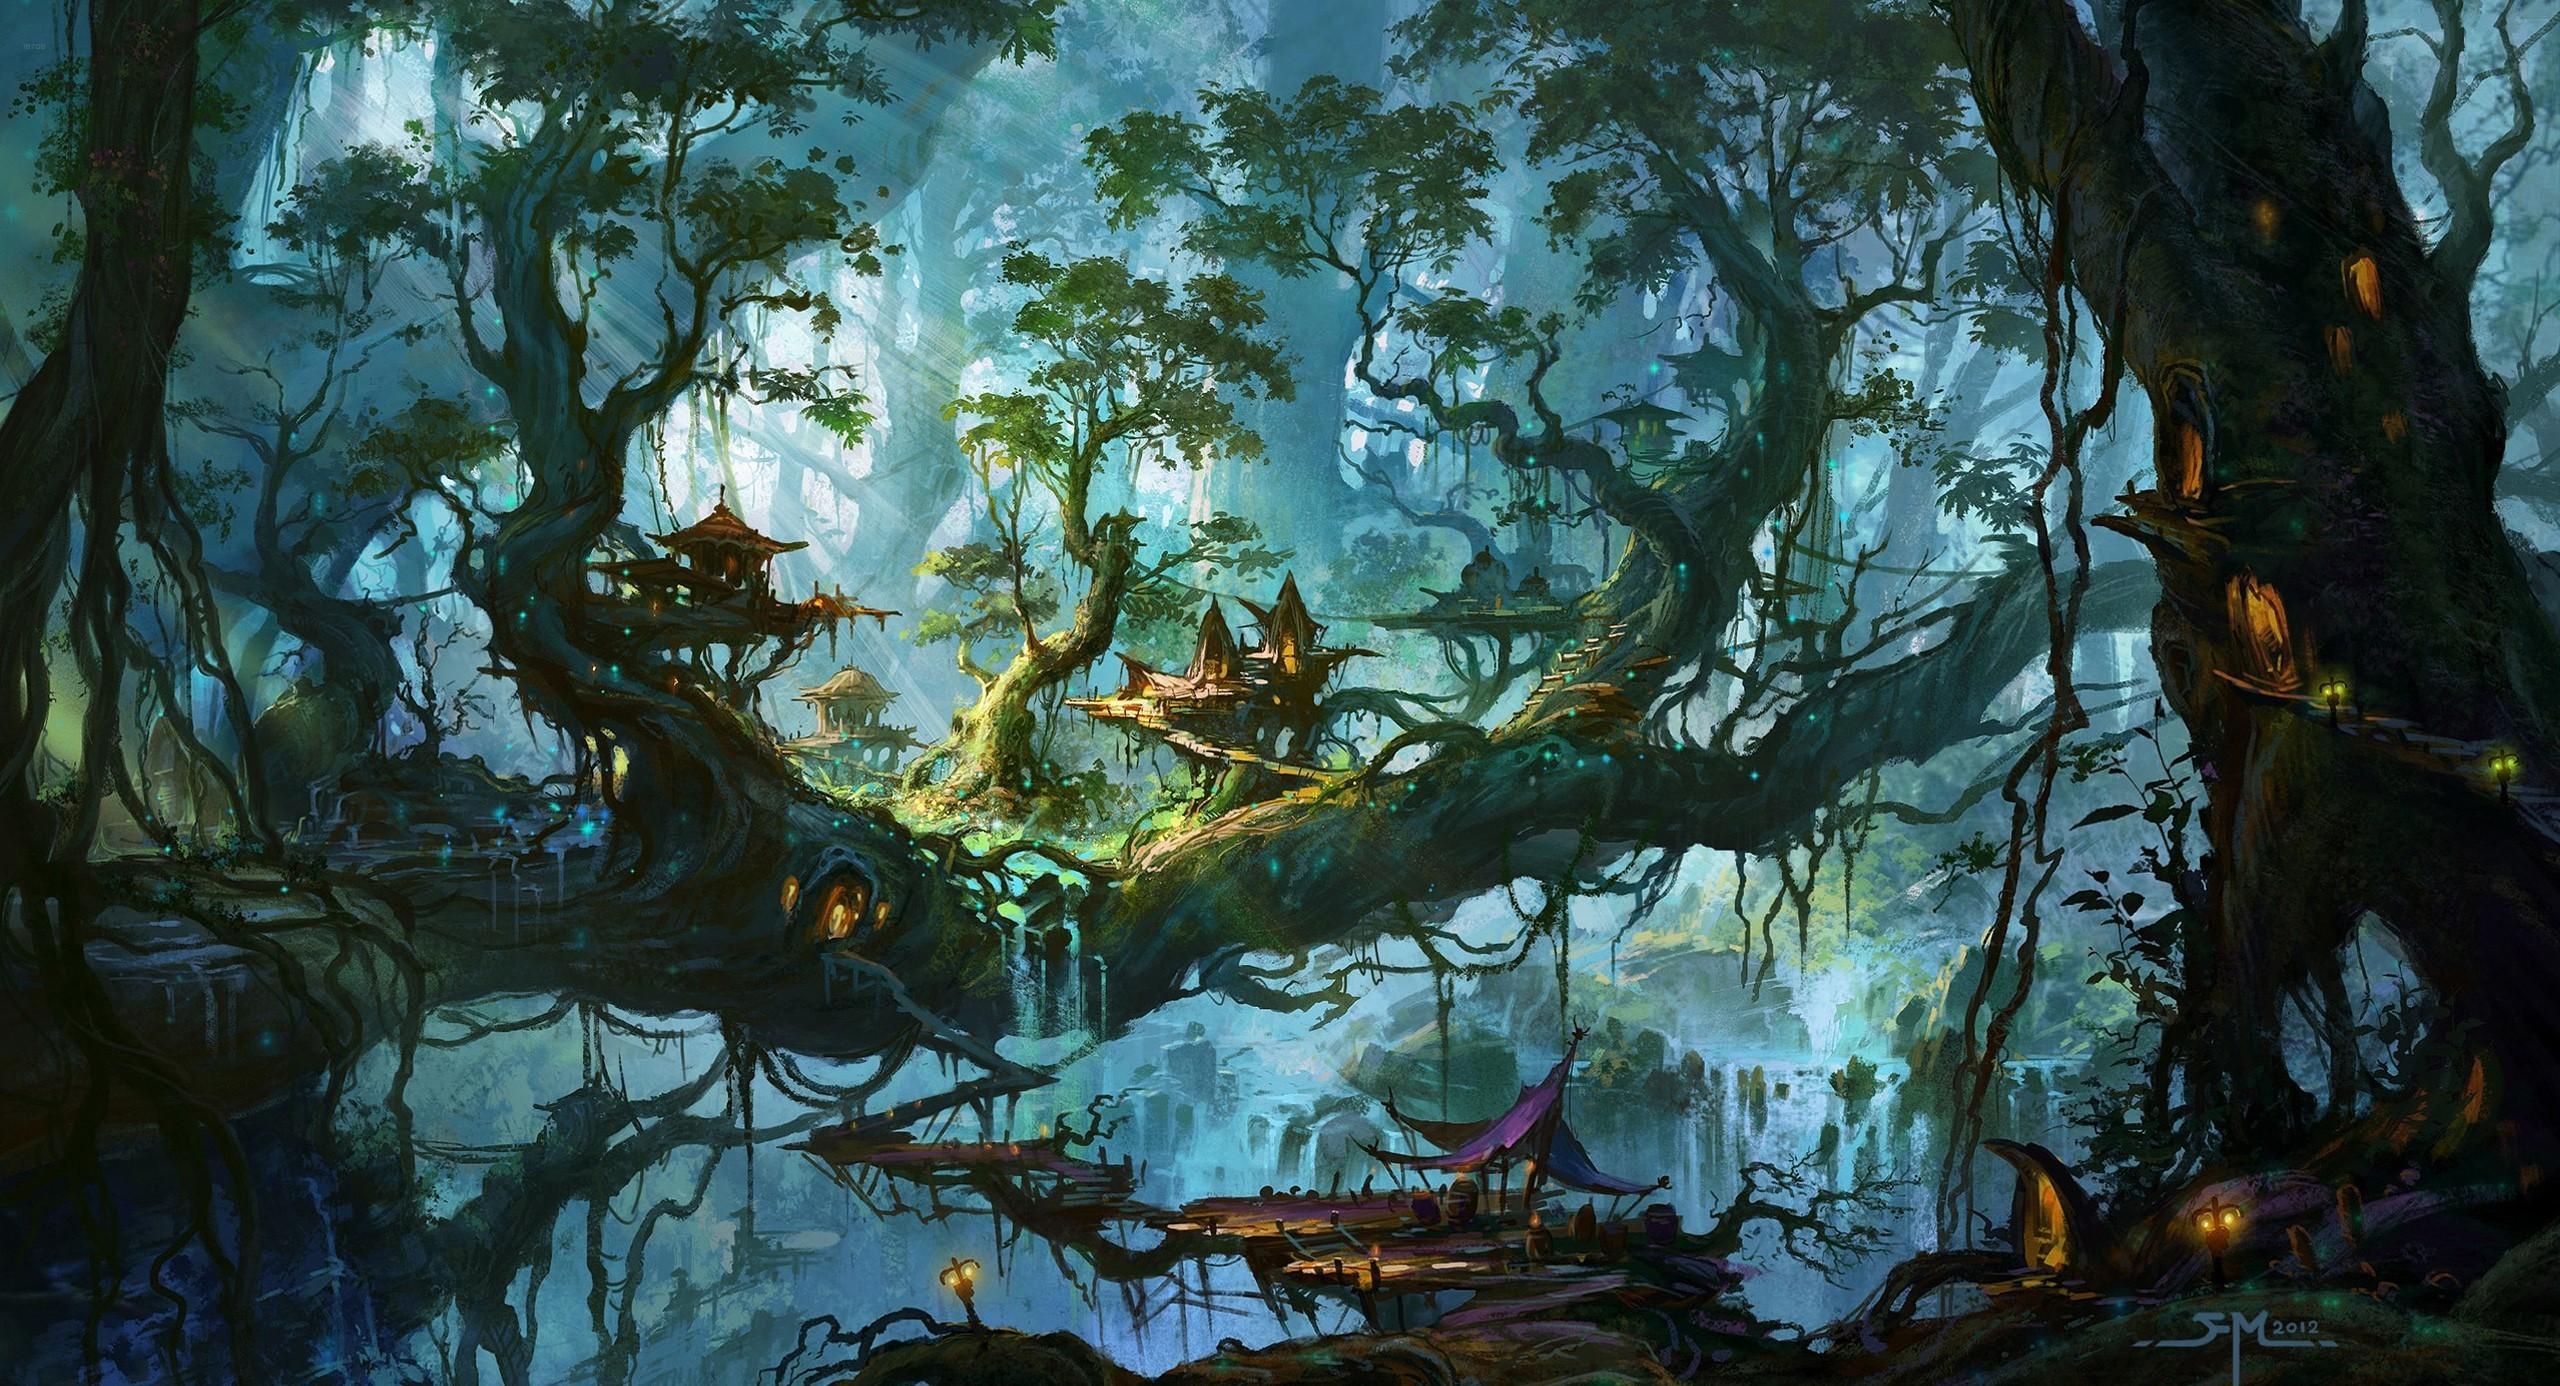 Fantasy Forest Wallpaper 85 Images